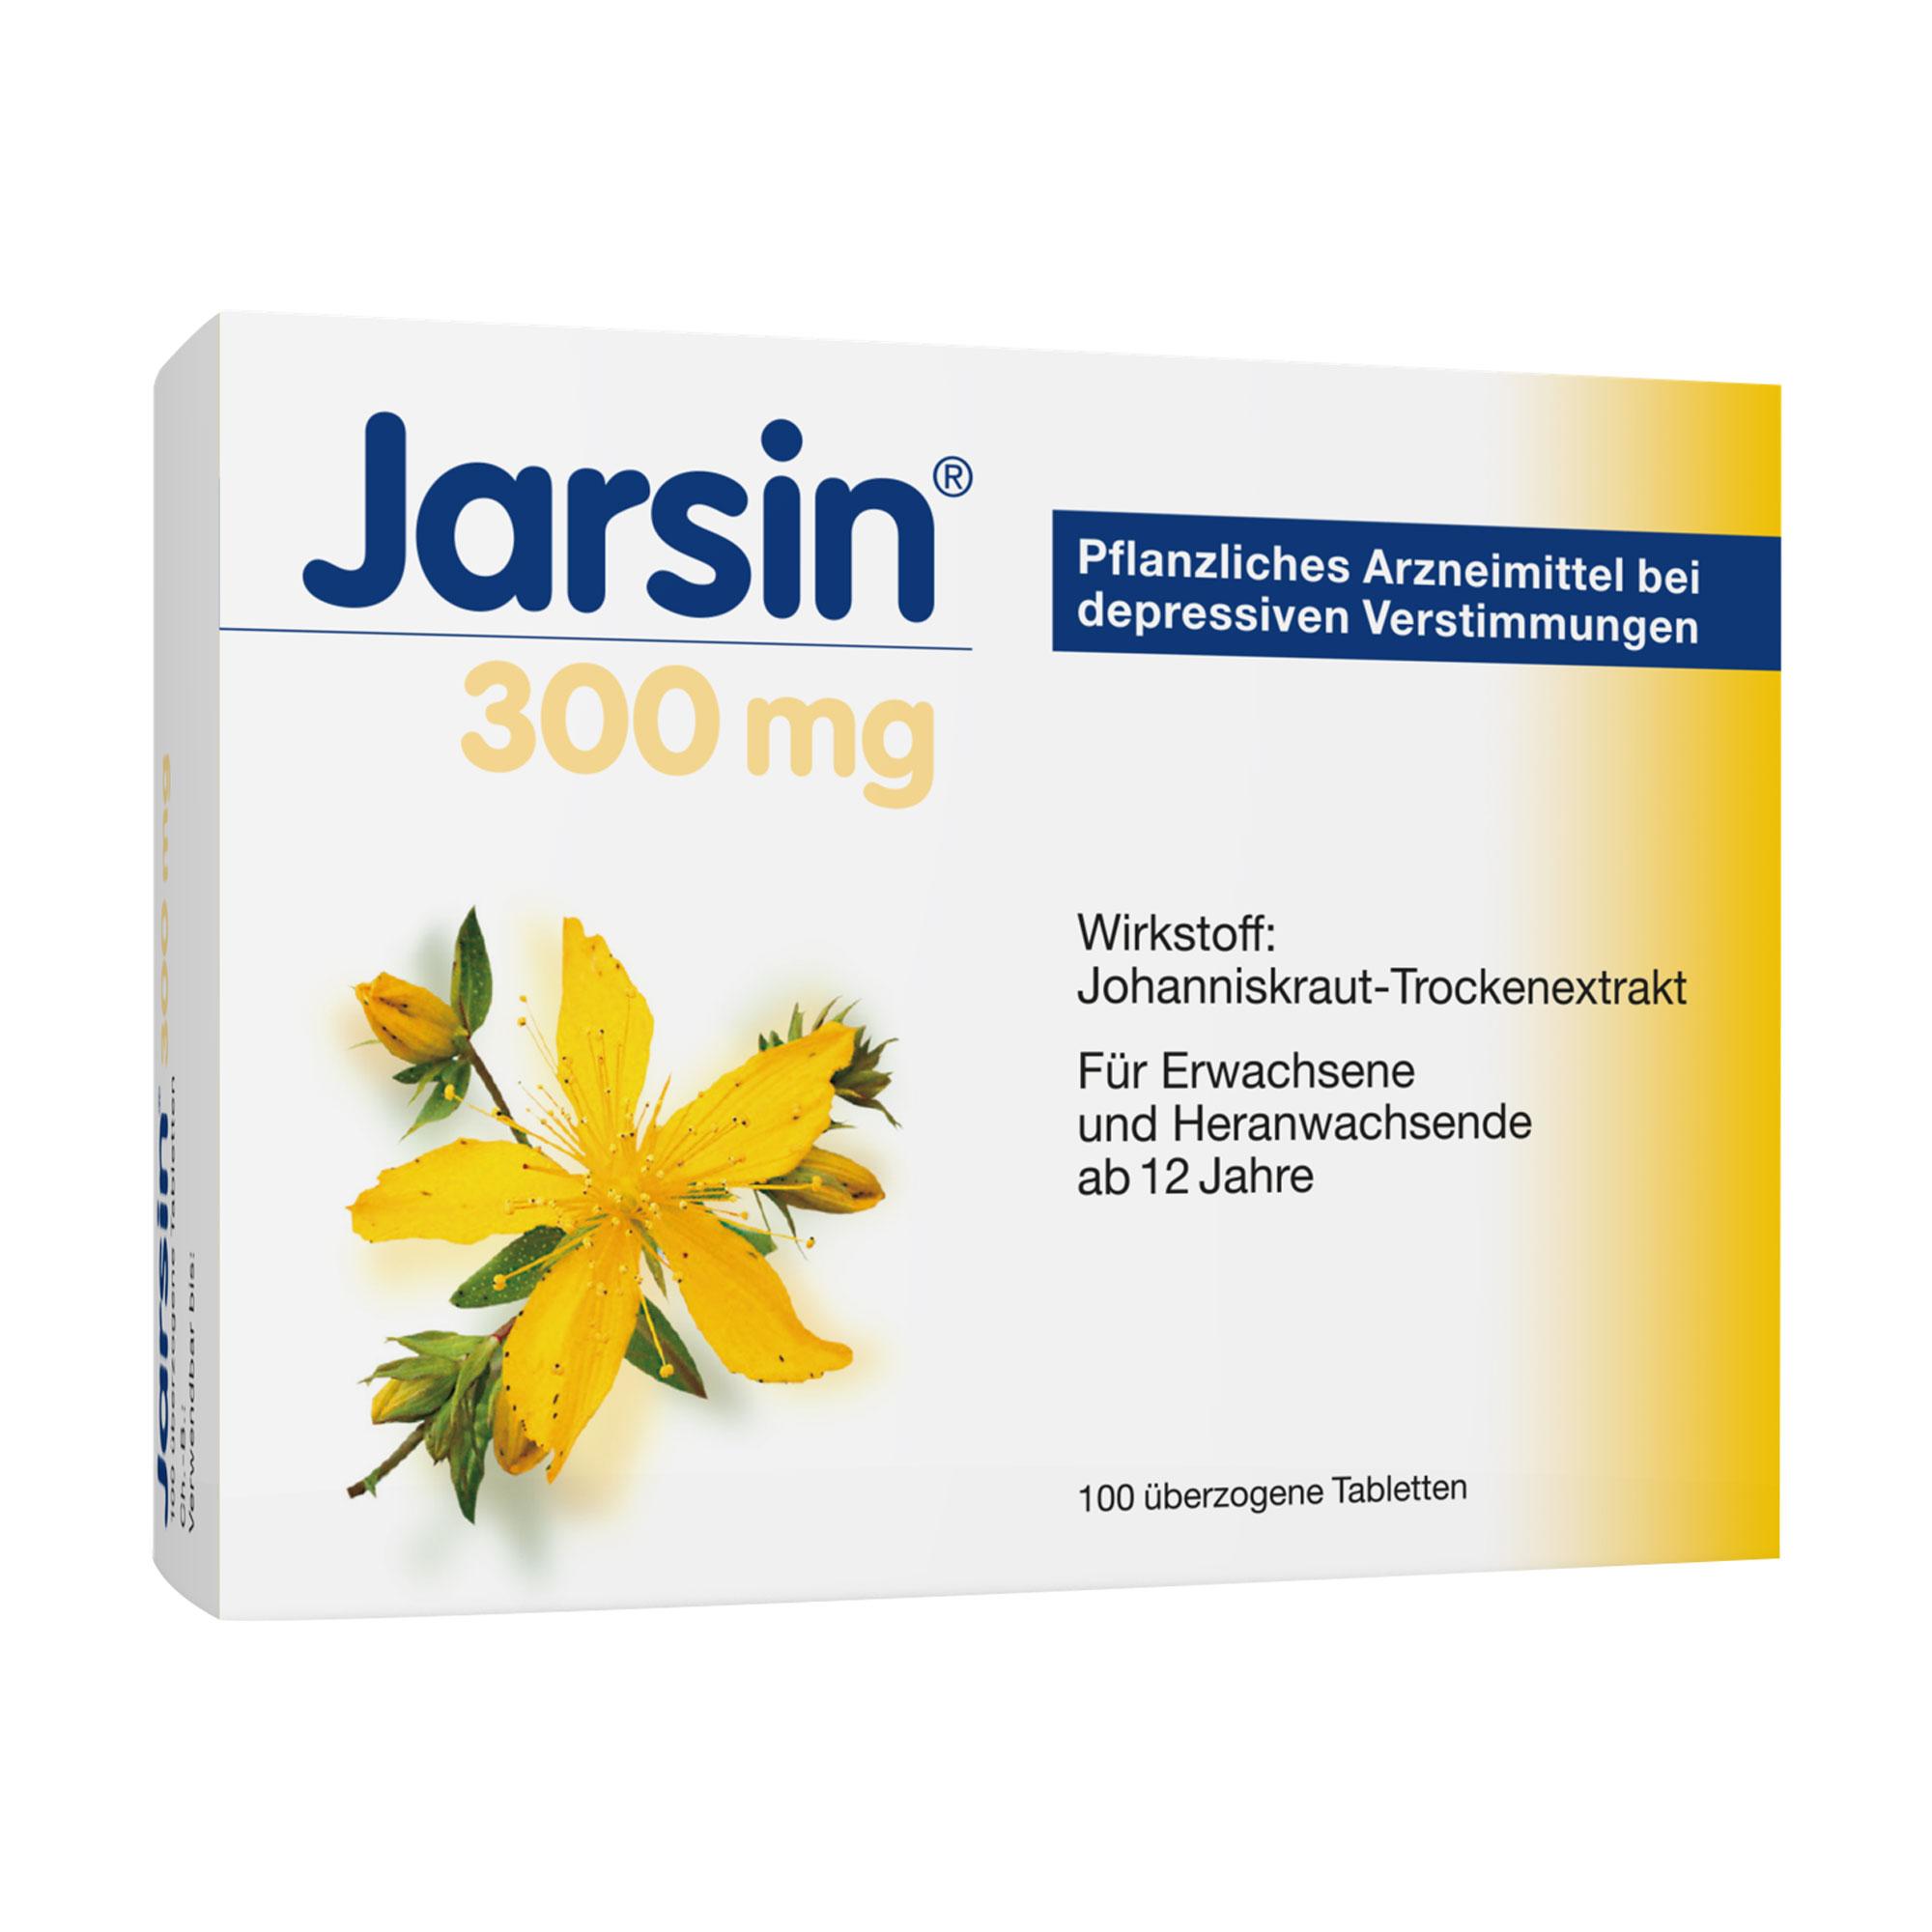 Jarsin 300 mg überzogene Tabletten